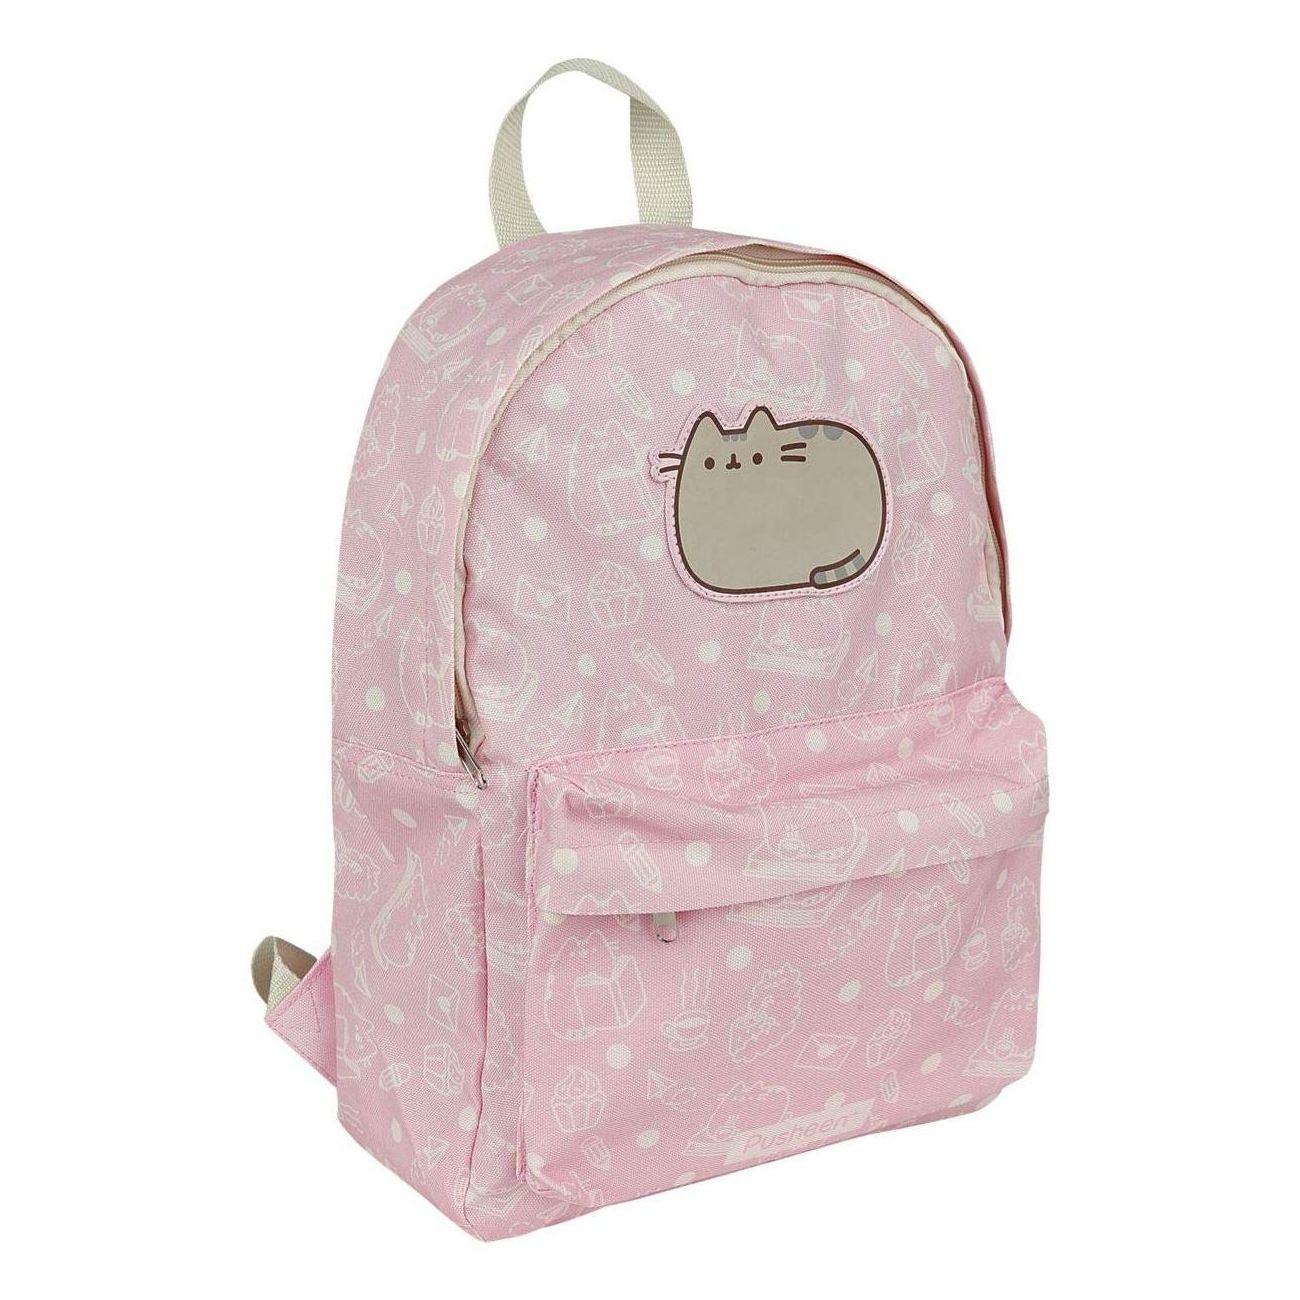 c7b6188a5cdc5 Różowy plecak Pusheen - Sklep Silvermet.eu